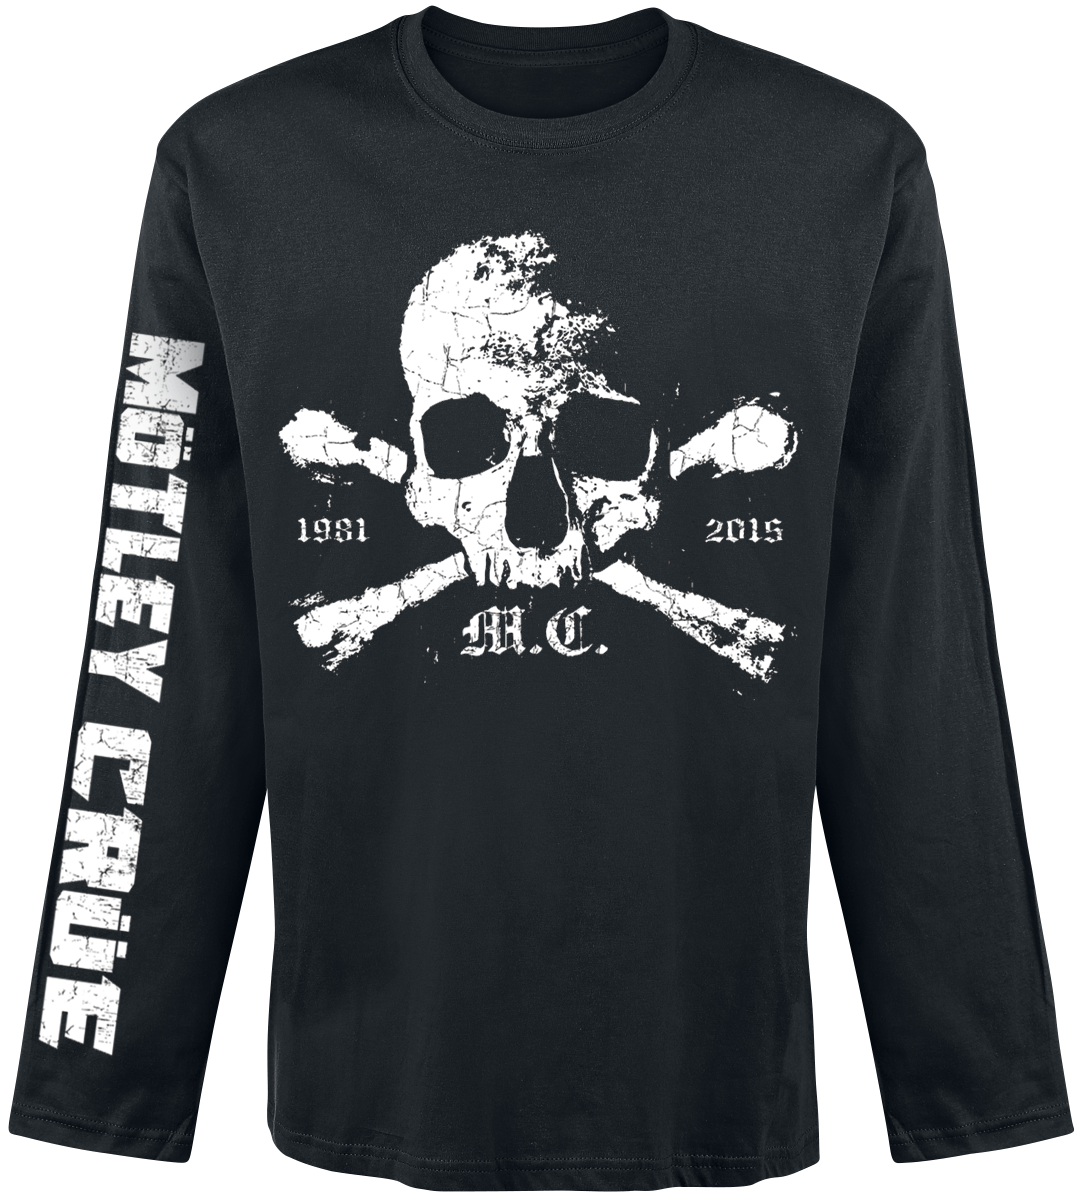 Mötley Crüe - Orbit Skull - Longsleeve - black image